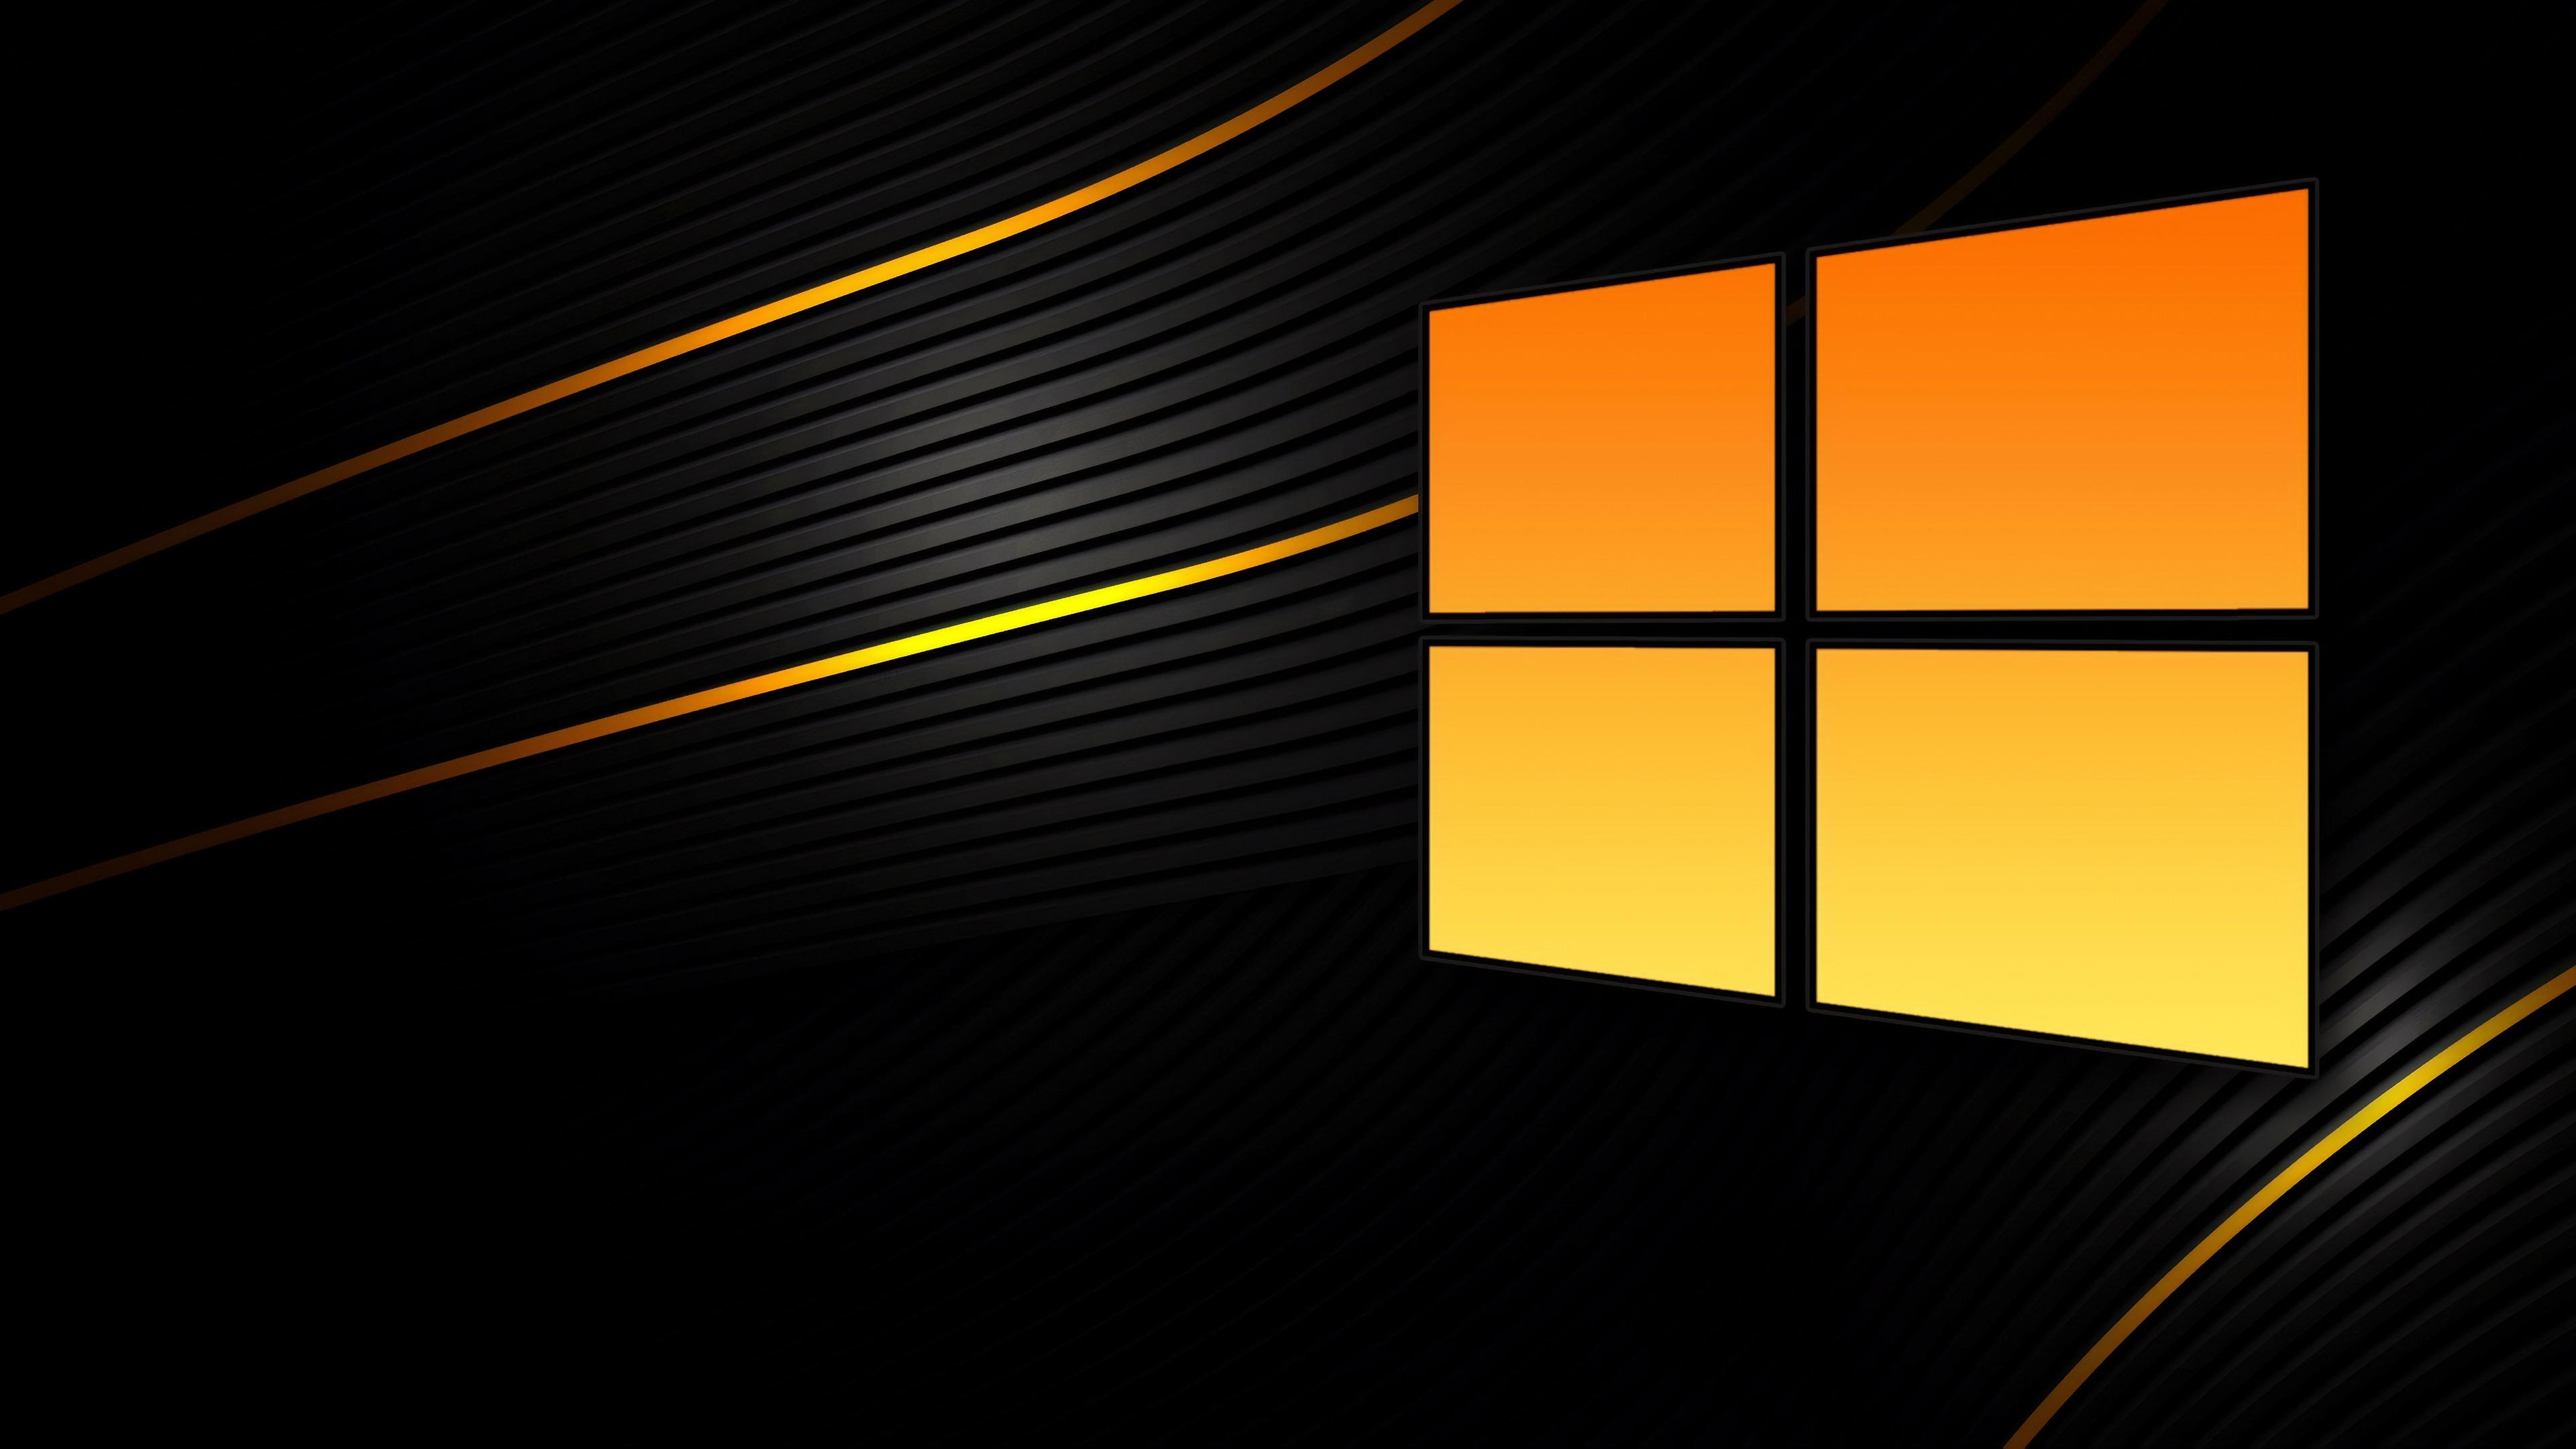 2018,微软,Windows 10,黑色,背景预览 | 10wallpaper.com